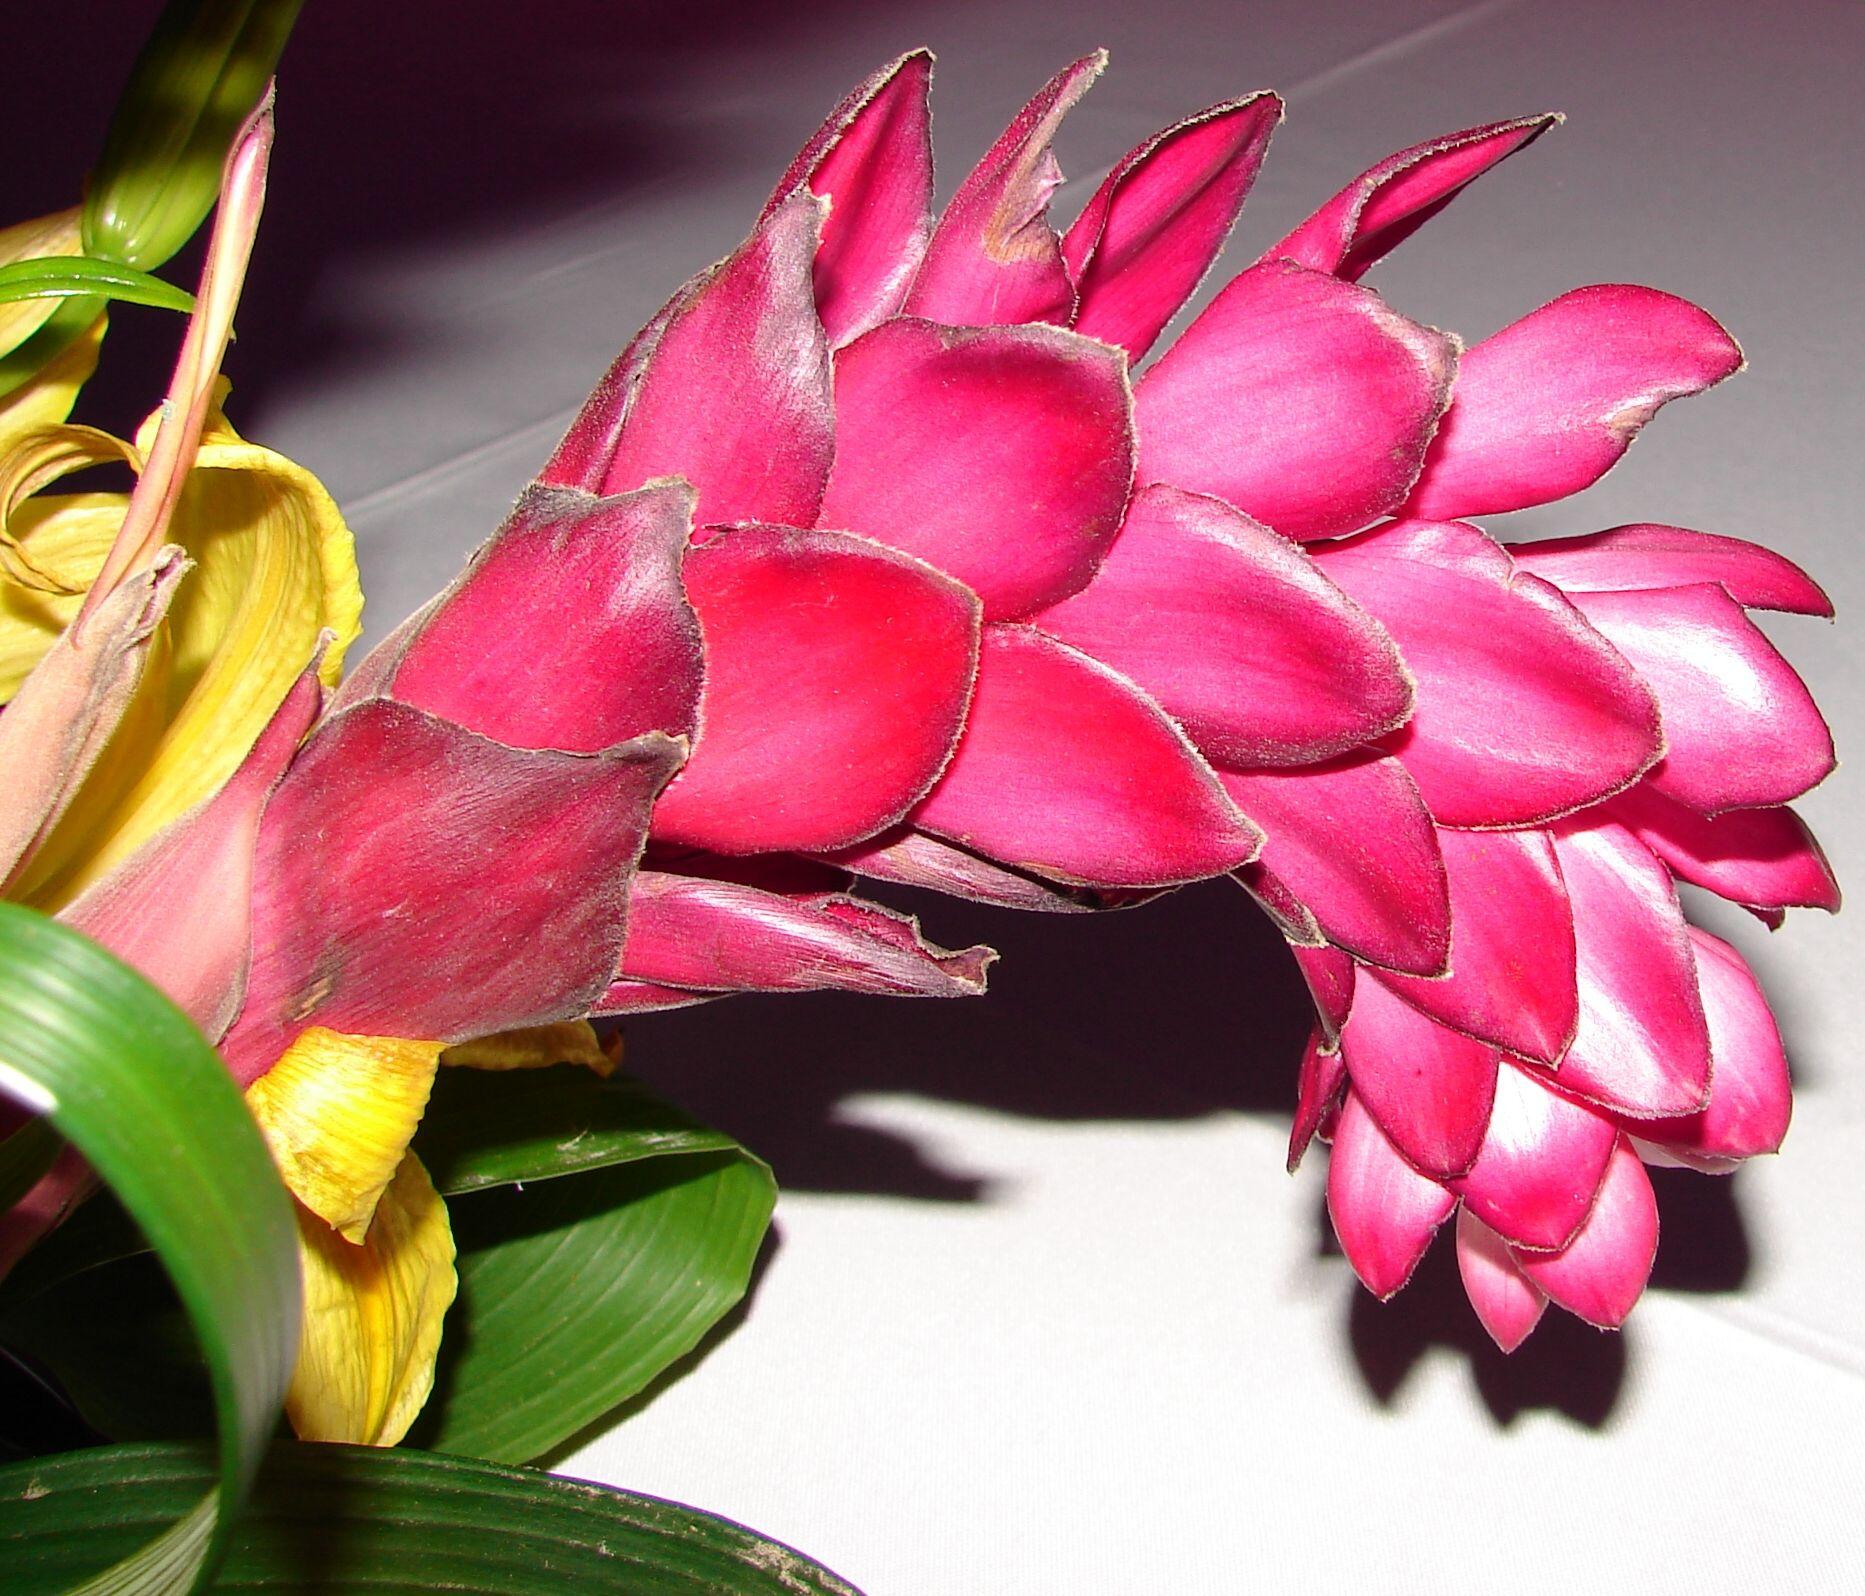 Exotic Red Tropical Flower 1 by FantasyStock.deviantart.com on @deviantART